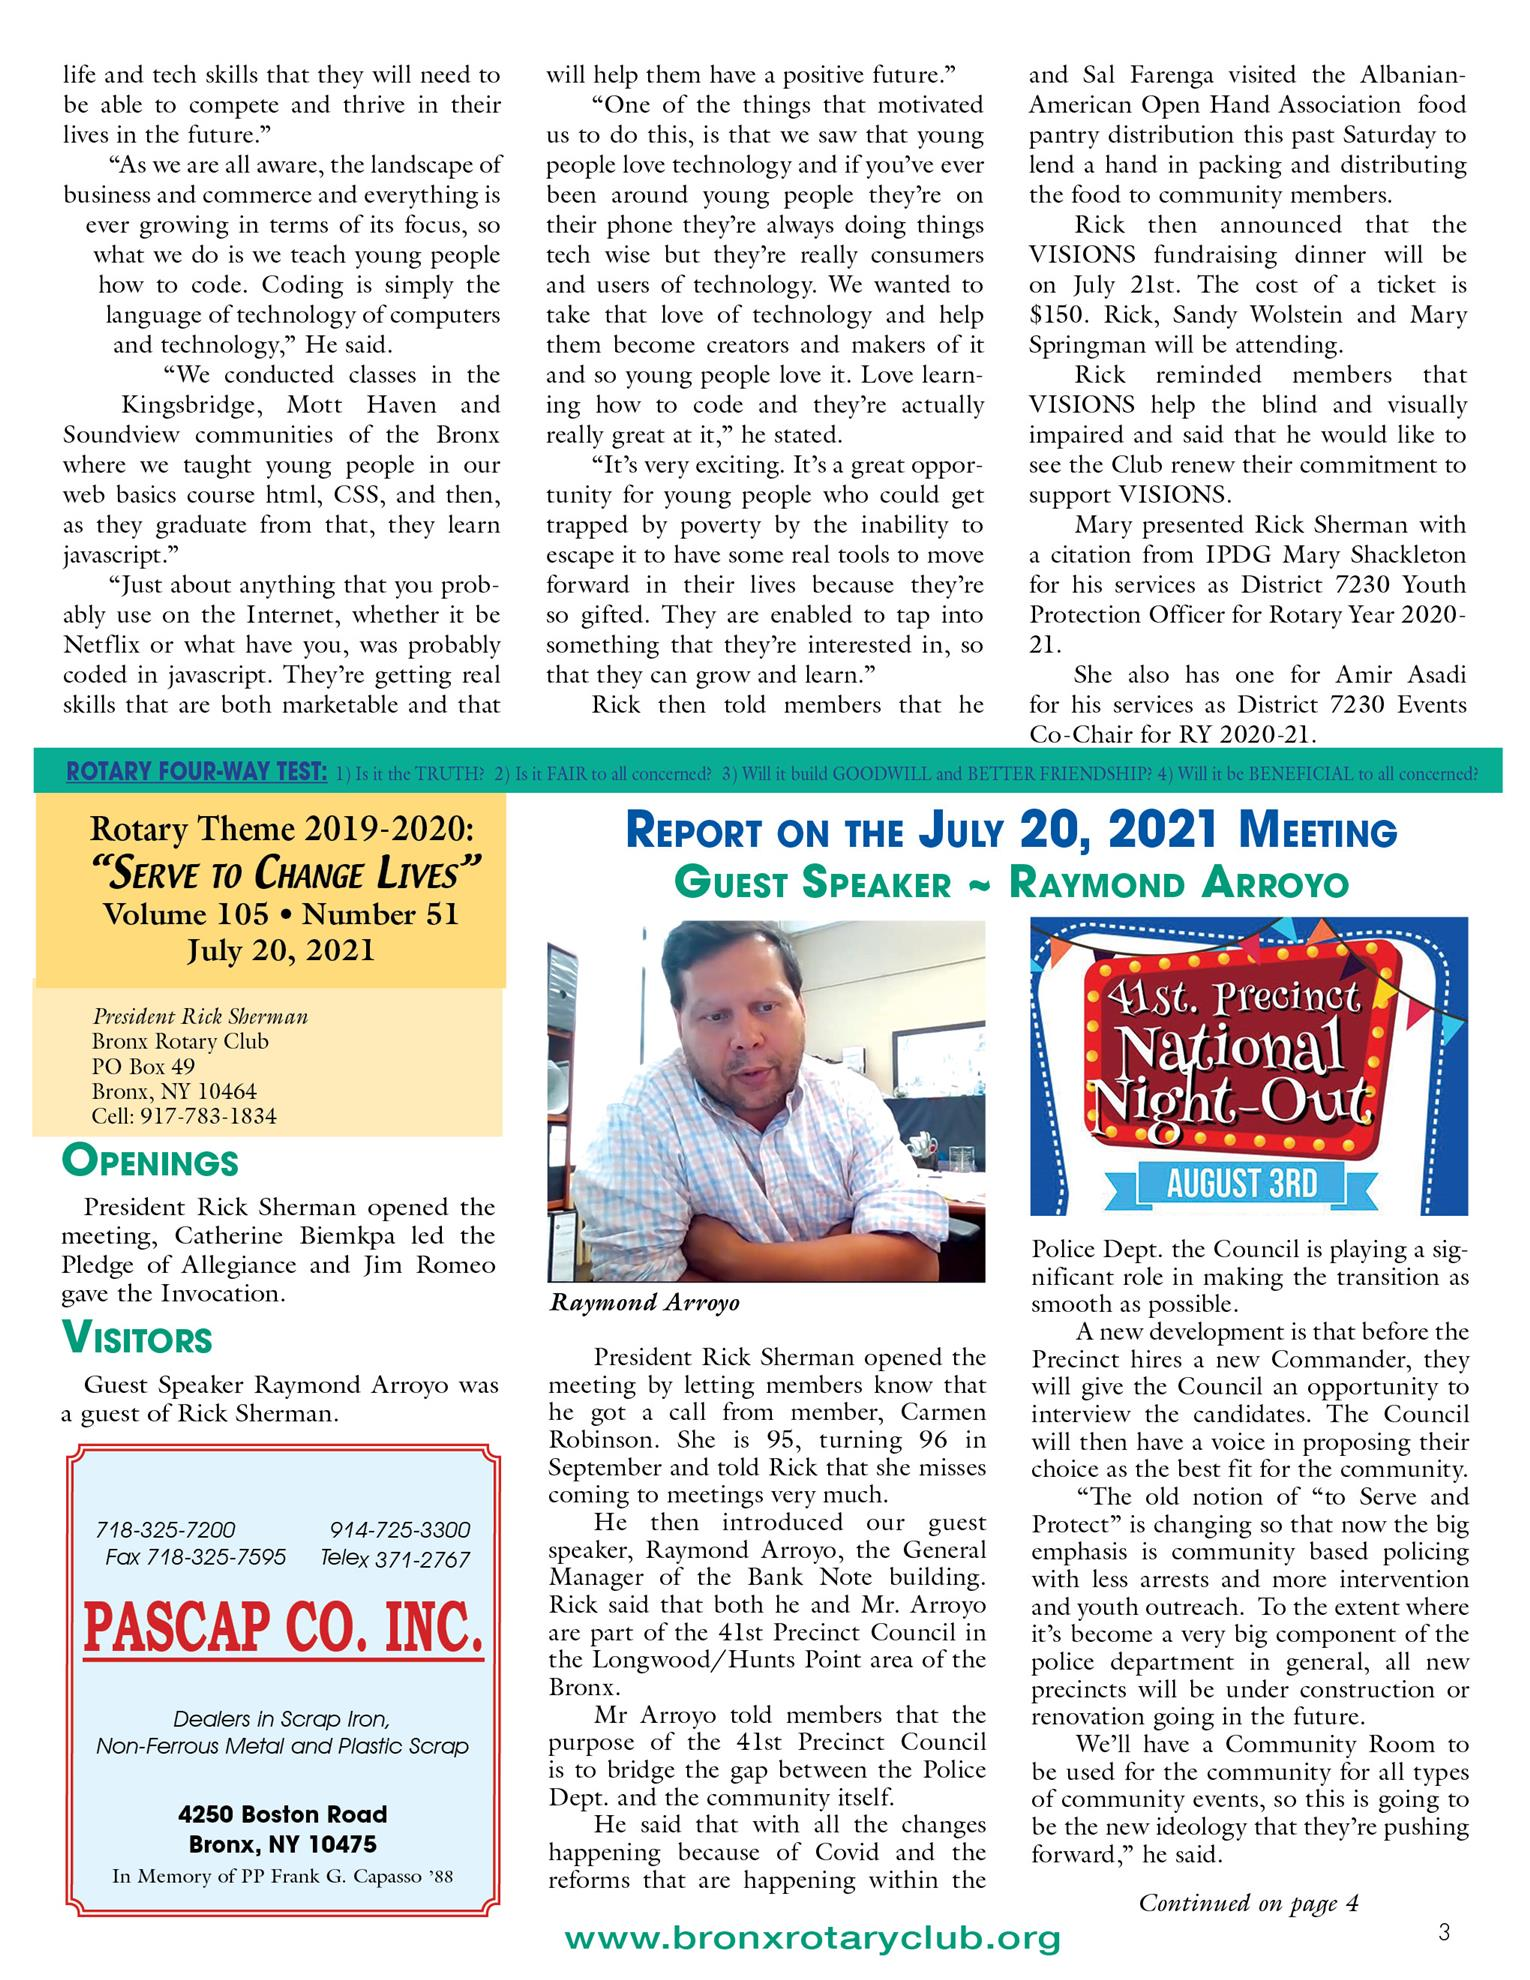 Tuesdays newsletter 7/6, 7/13 & 7/20/2021 p3